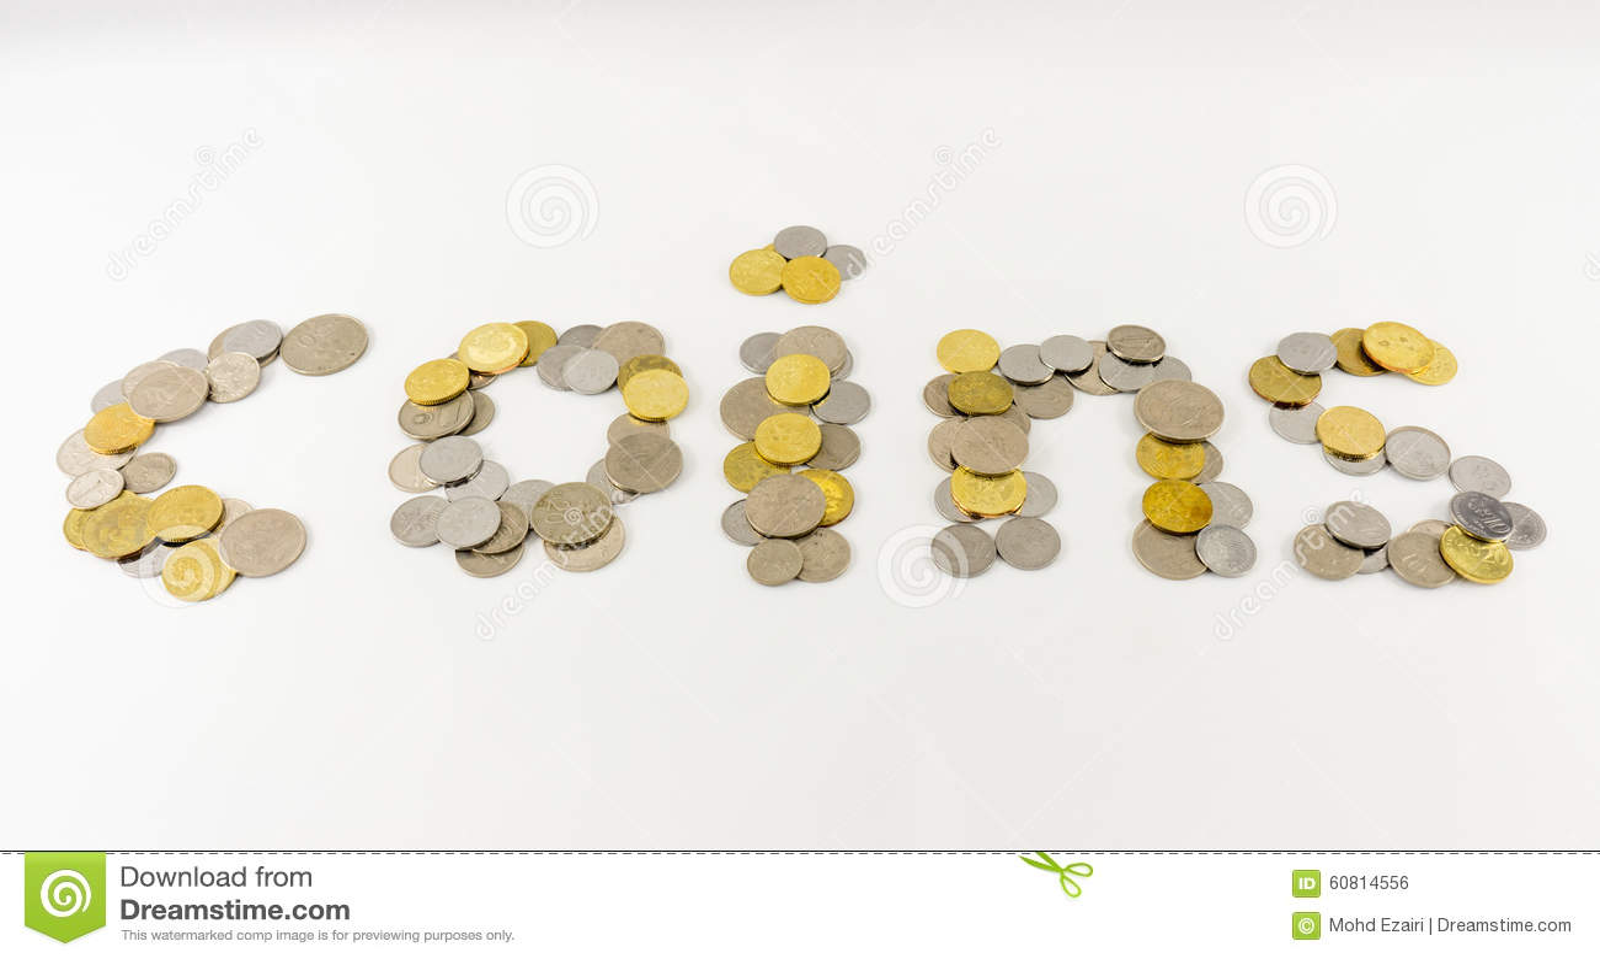 phrase on coins